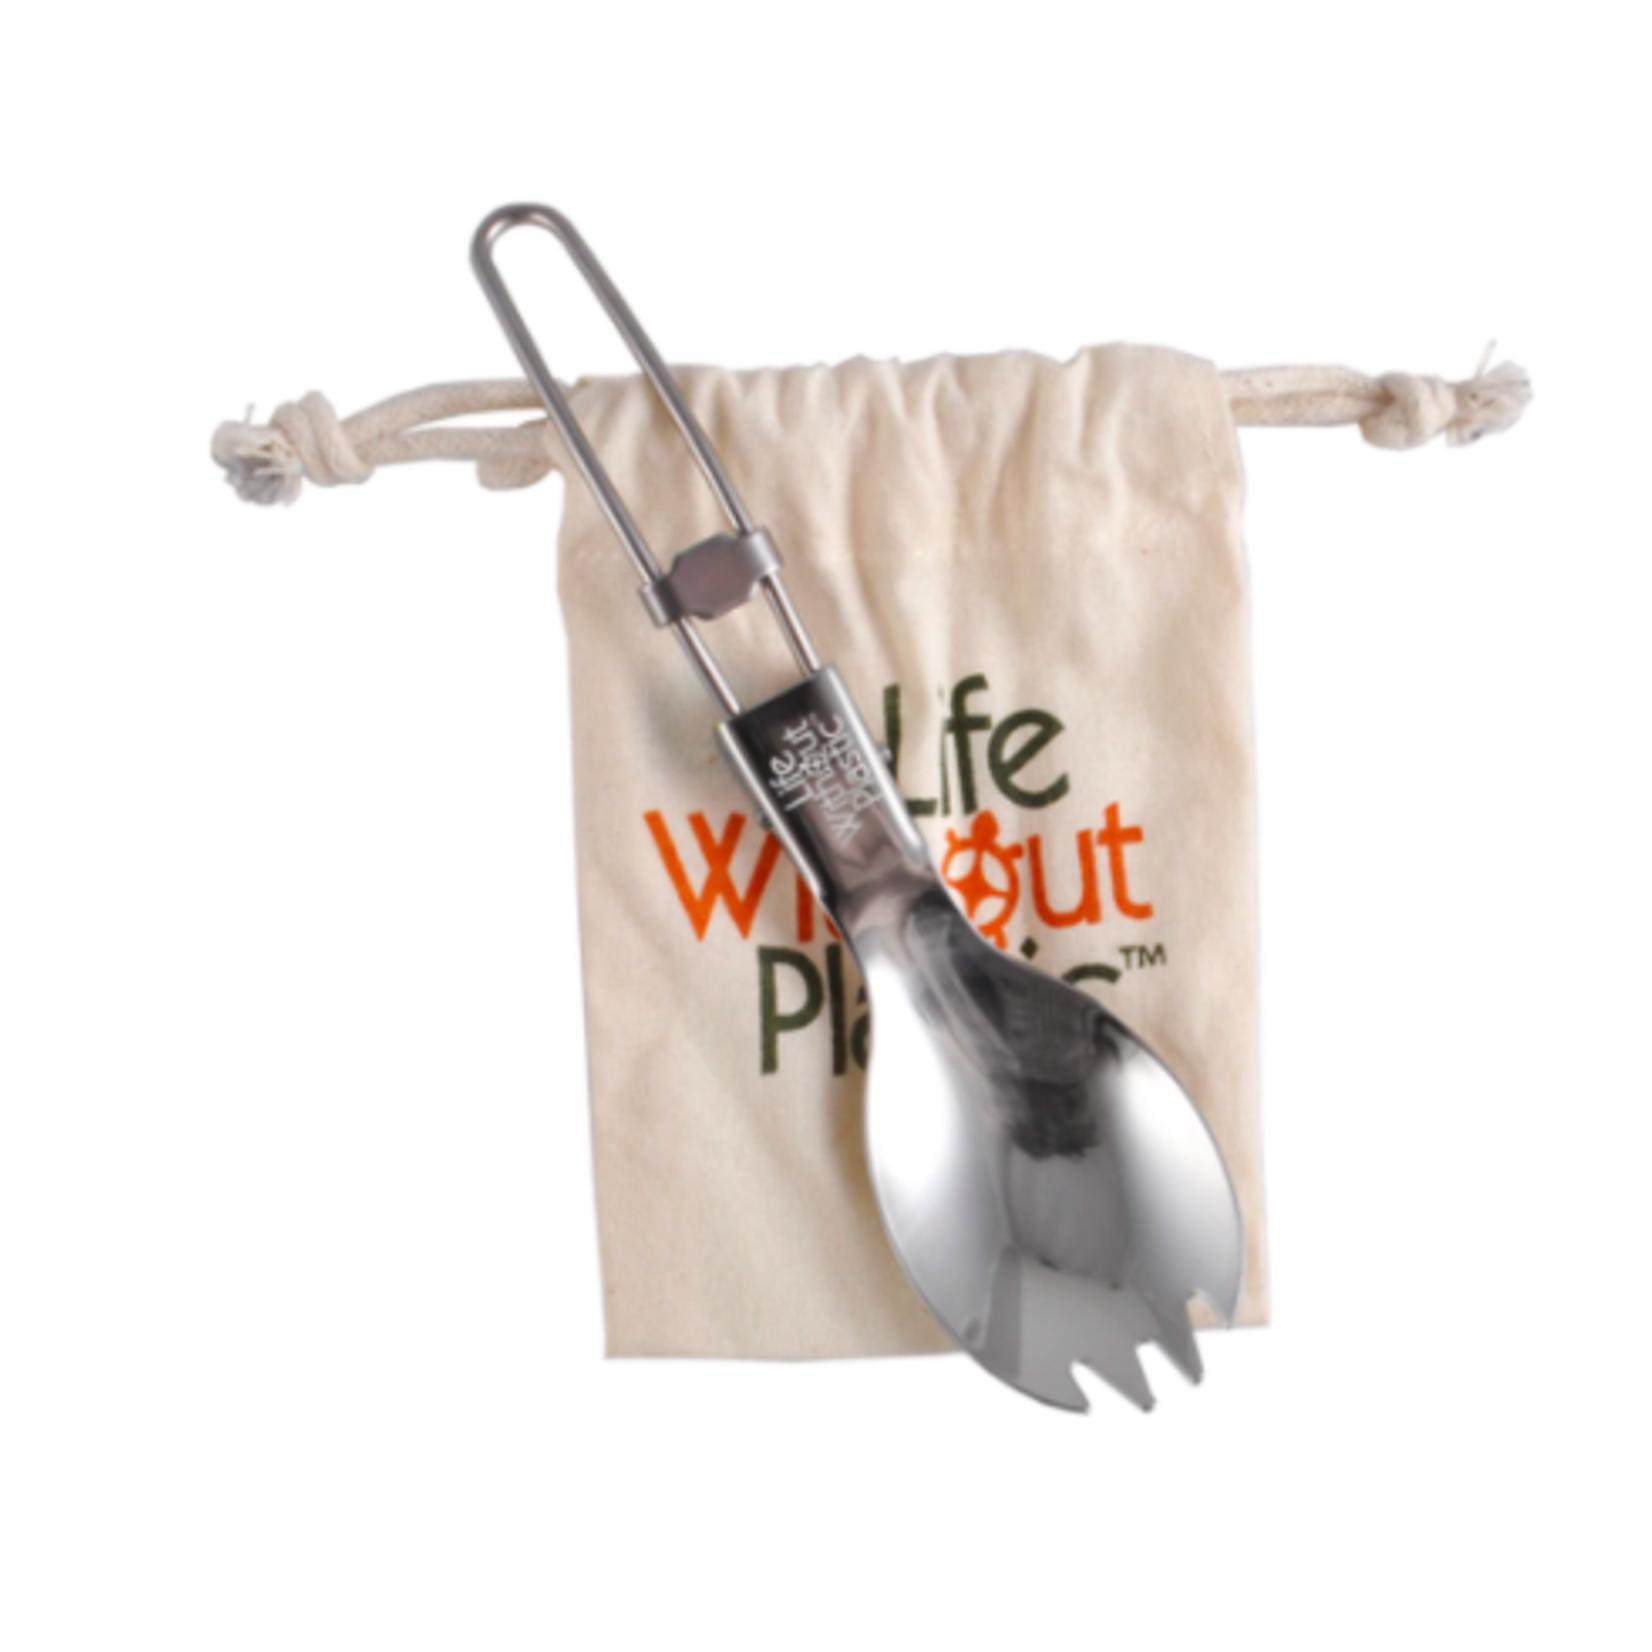 Life Without Plastic Folding Spork